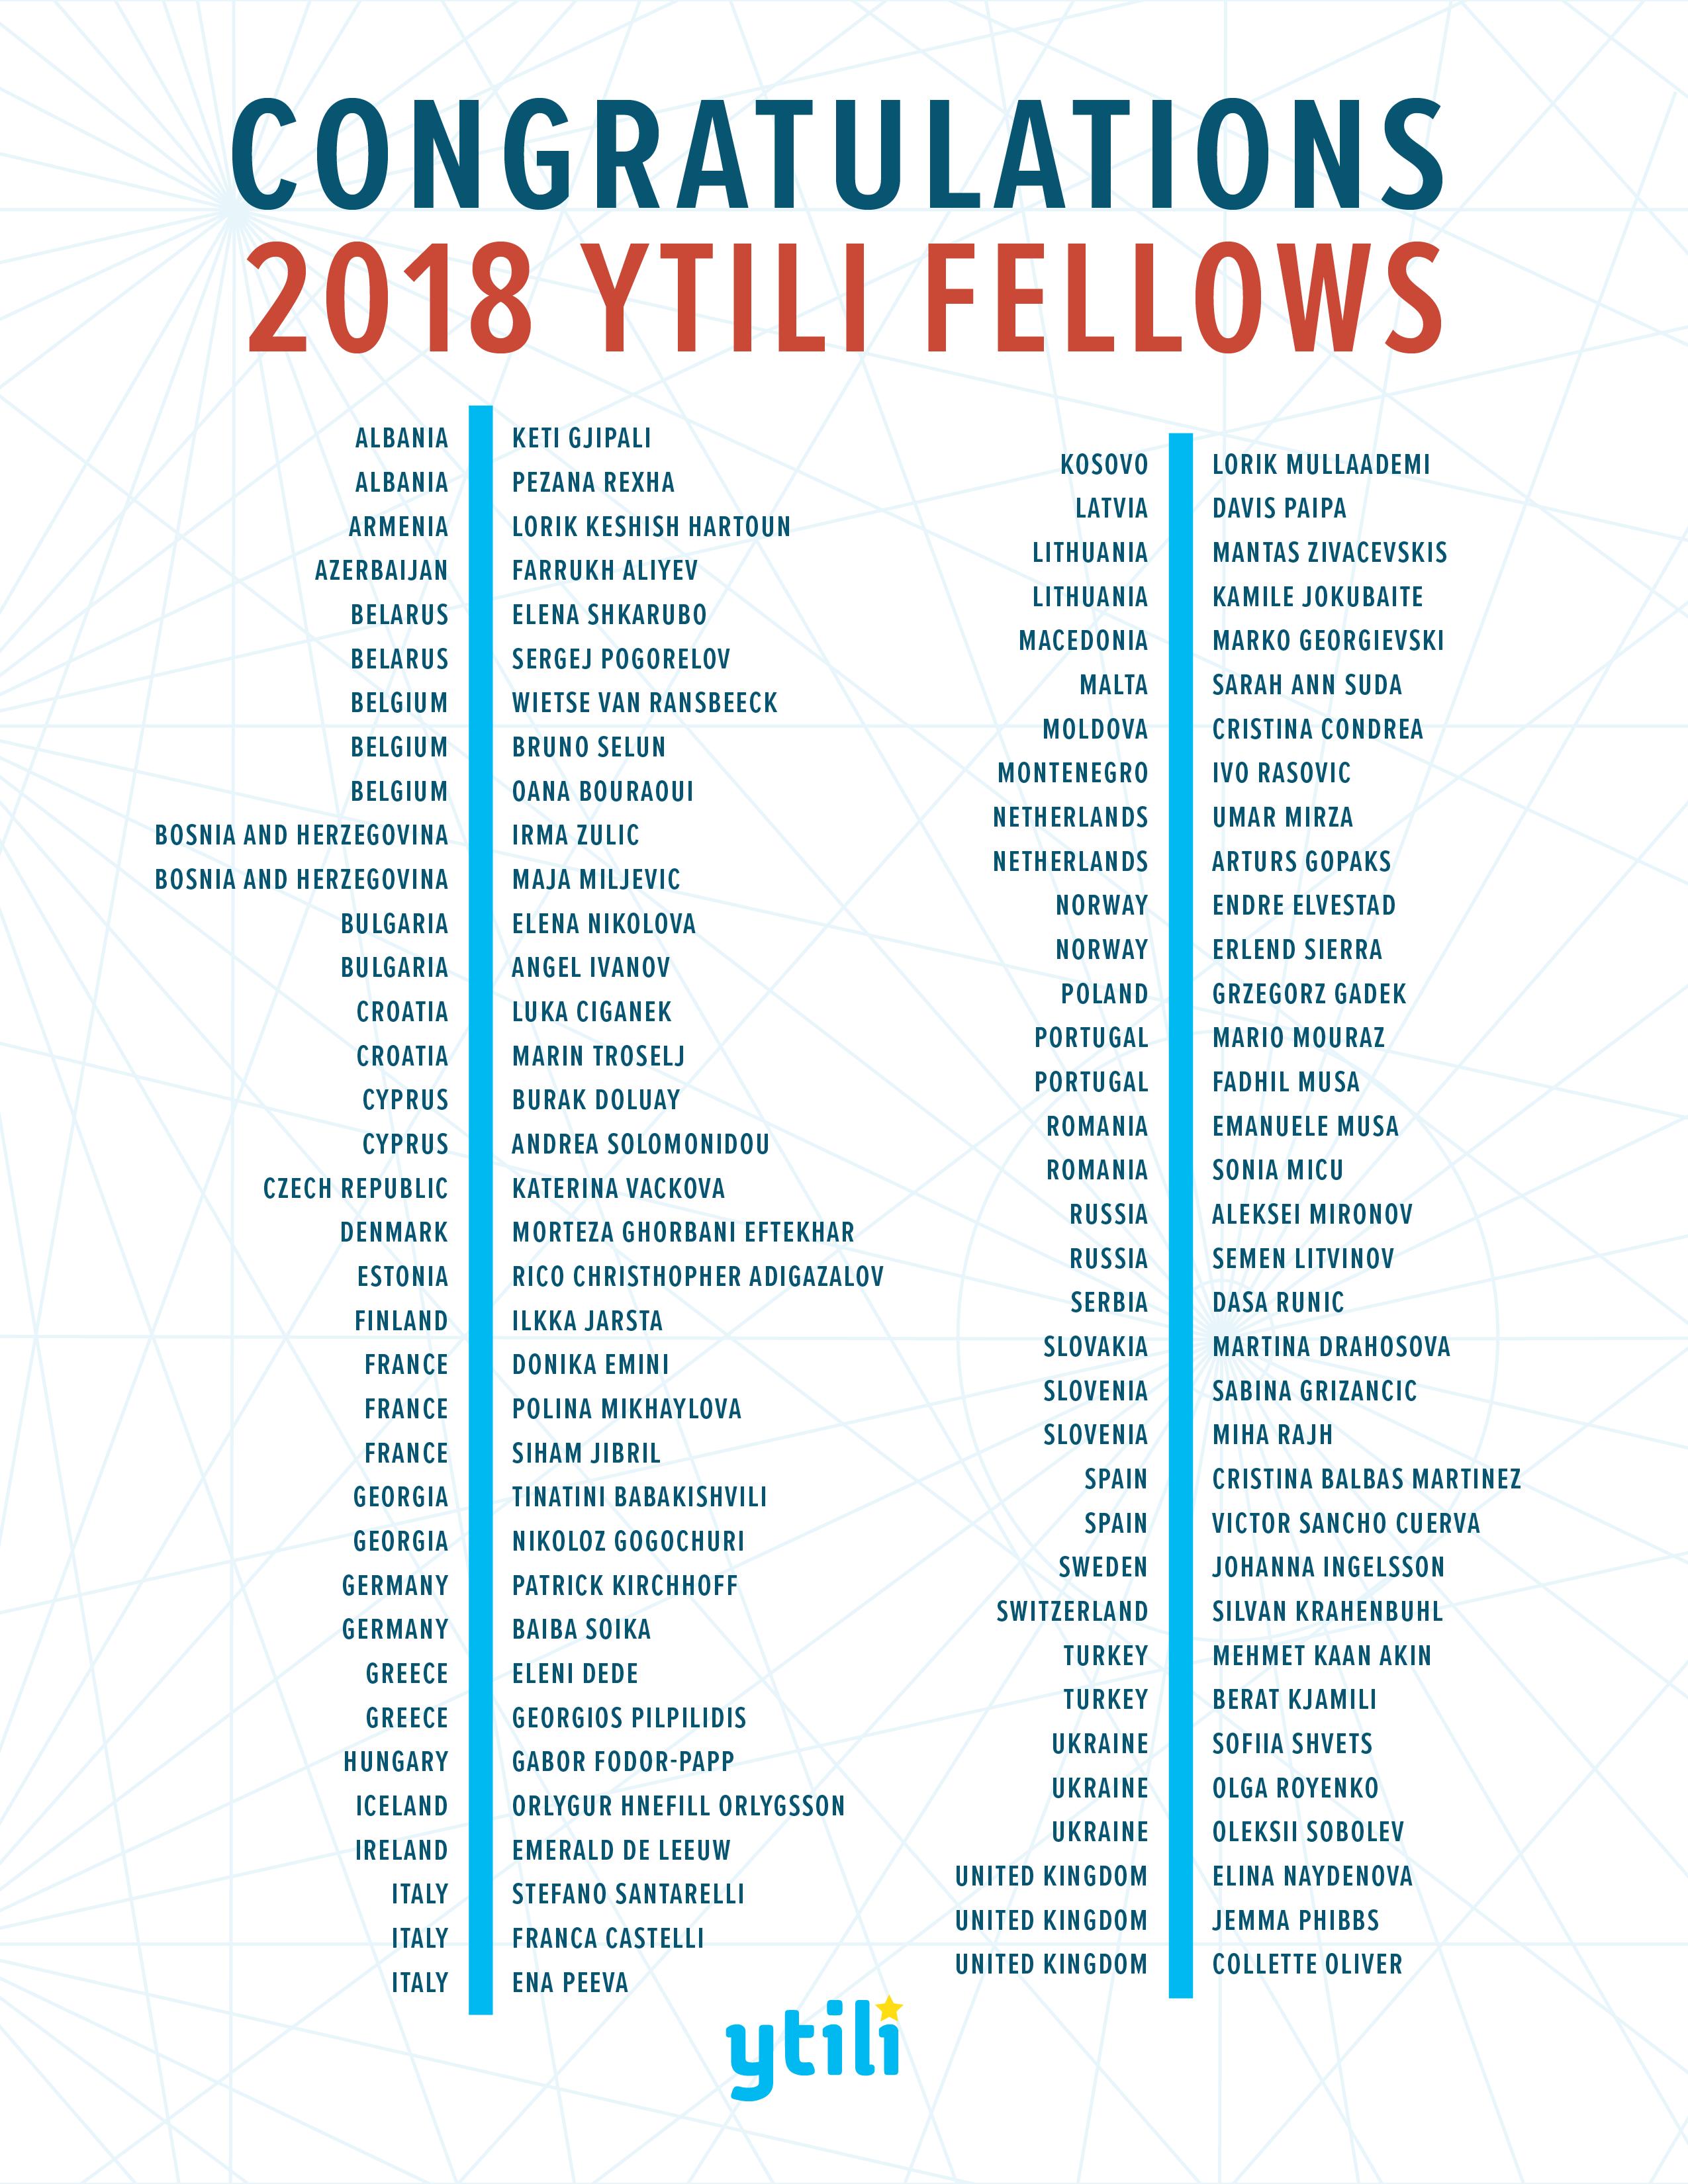 List of 2018 YTILI Fellows